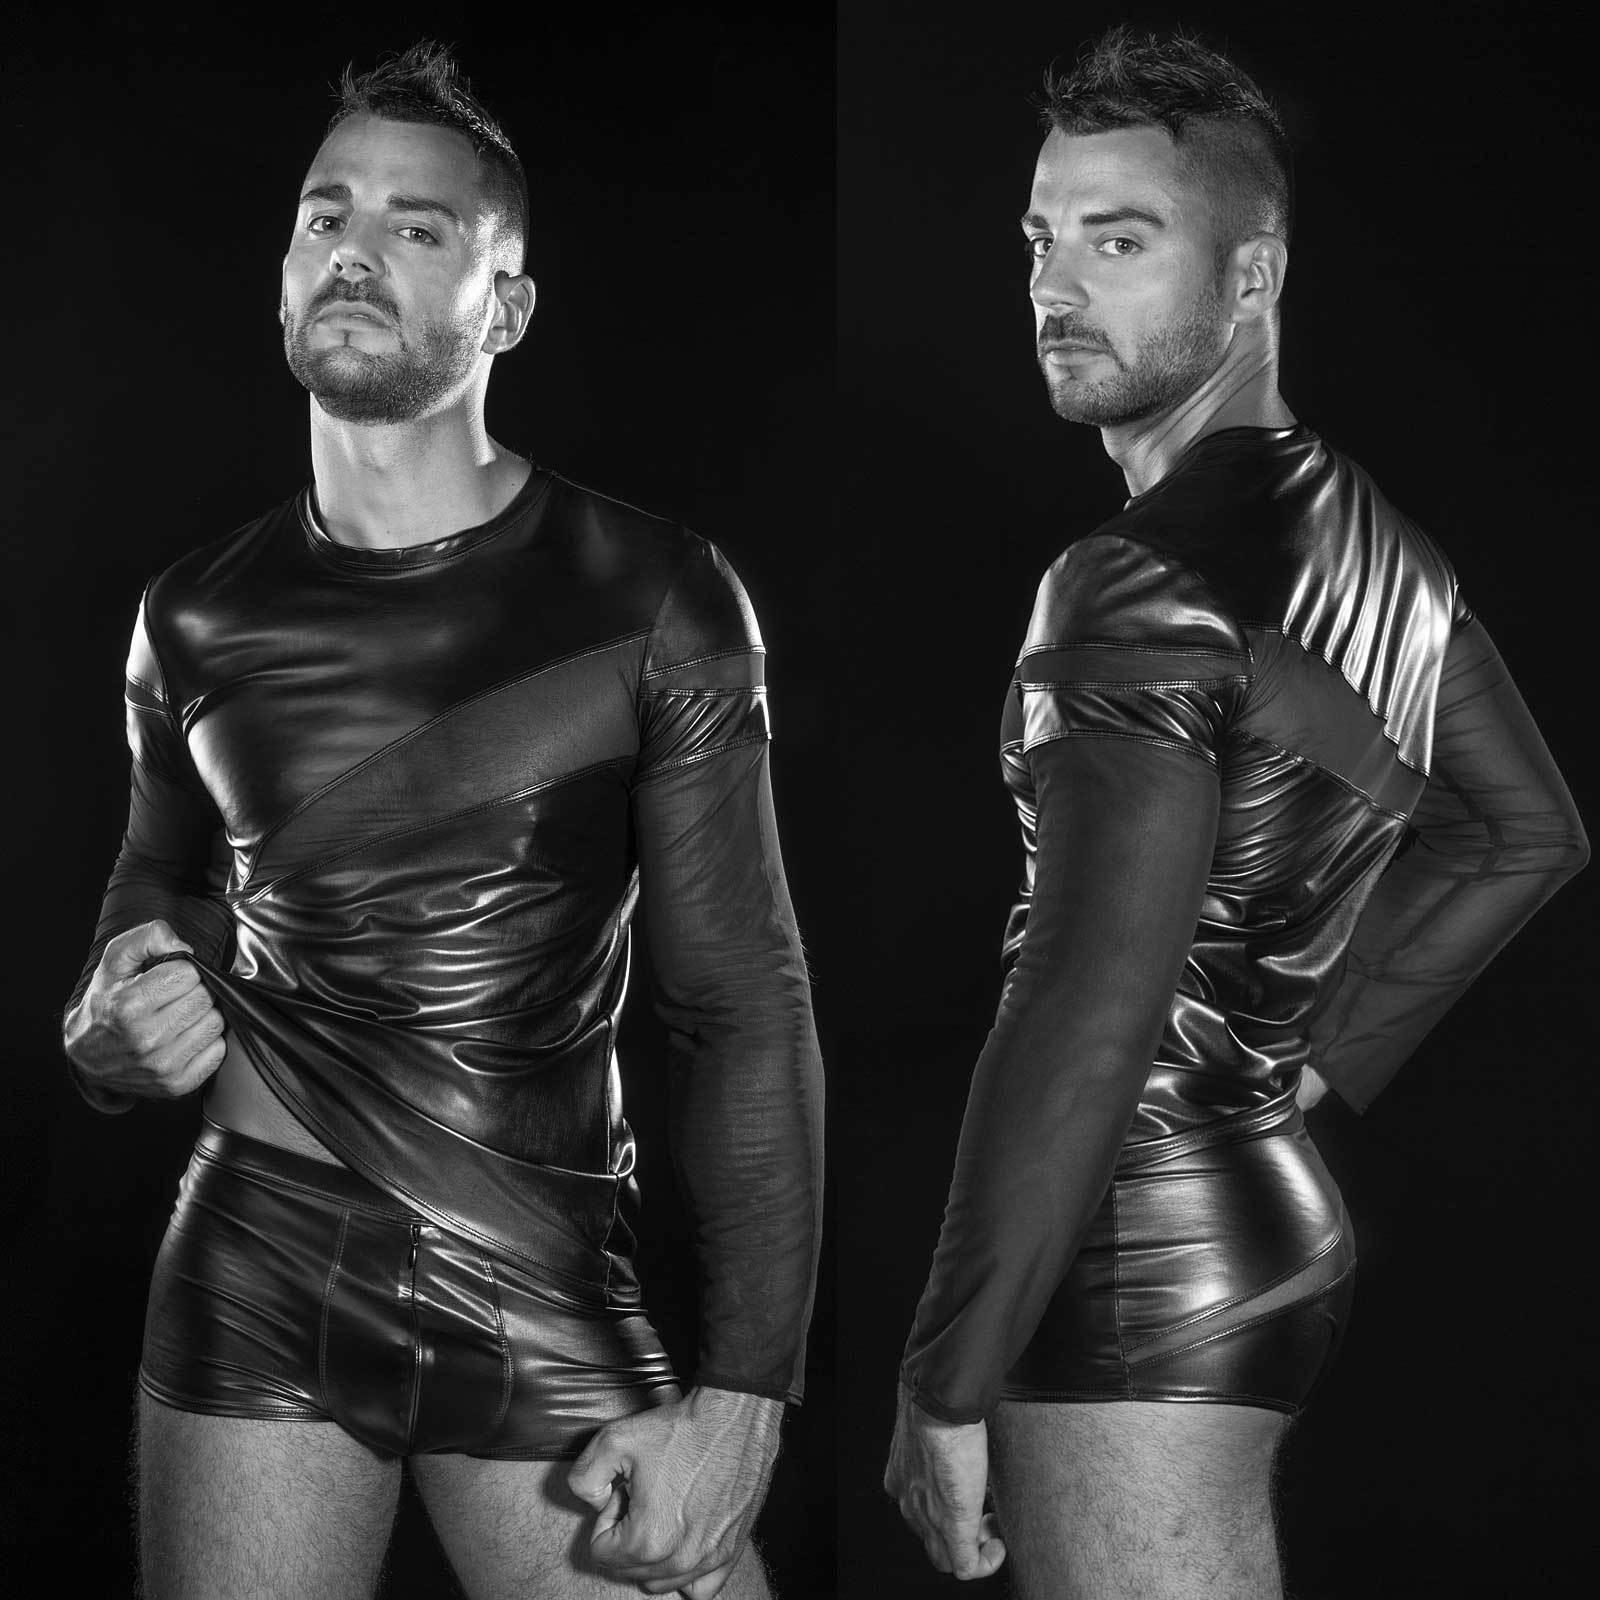 Patrice Catanzaro Alexander Camica Shirt effetto bagnato effetto Mesh Top Clubwear for men